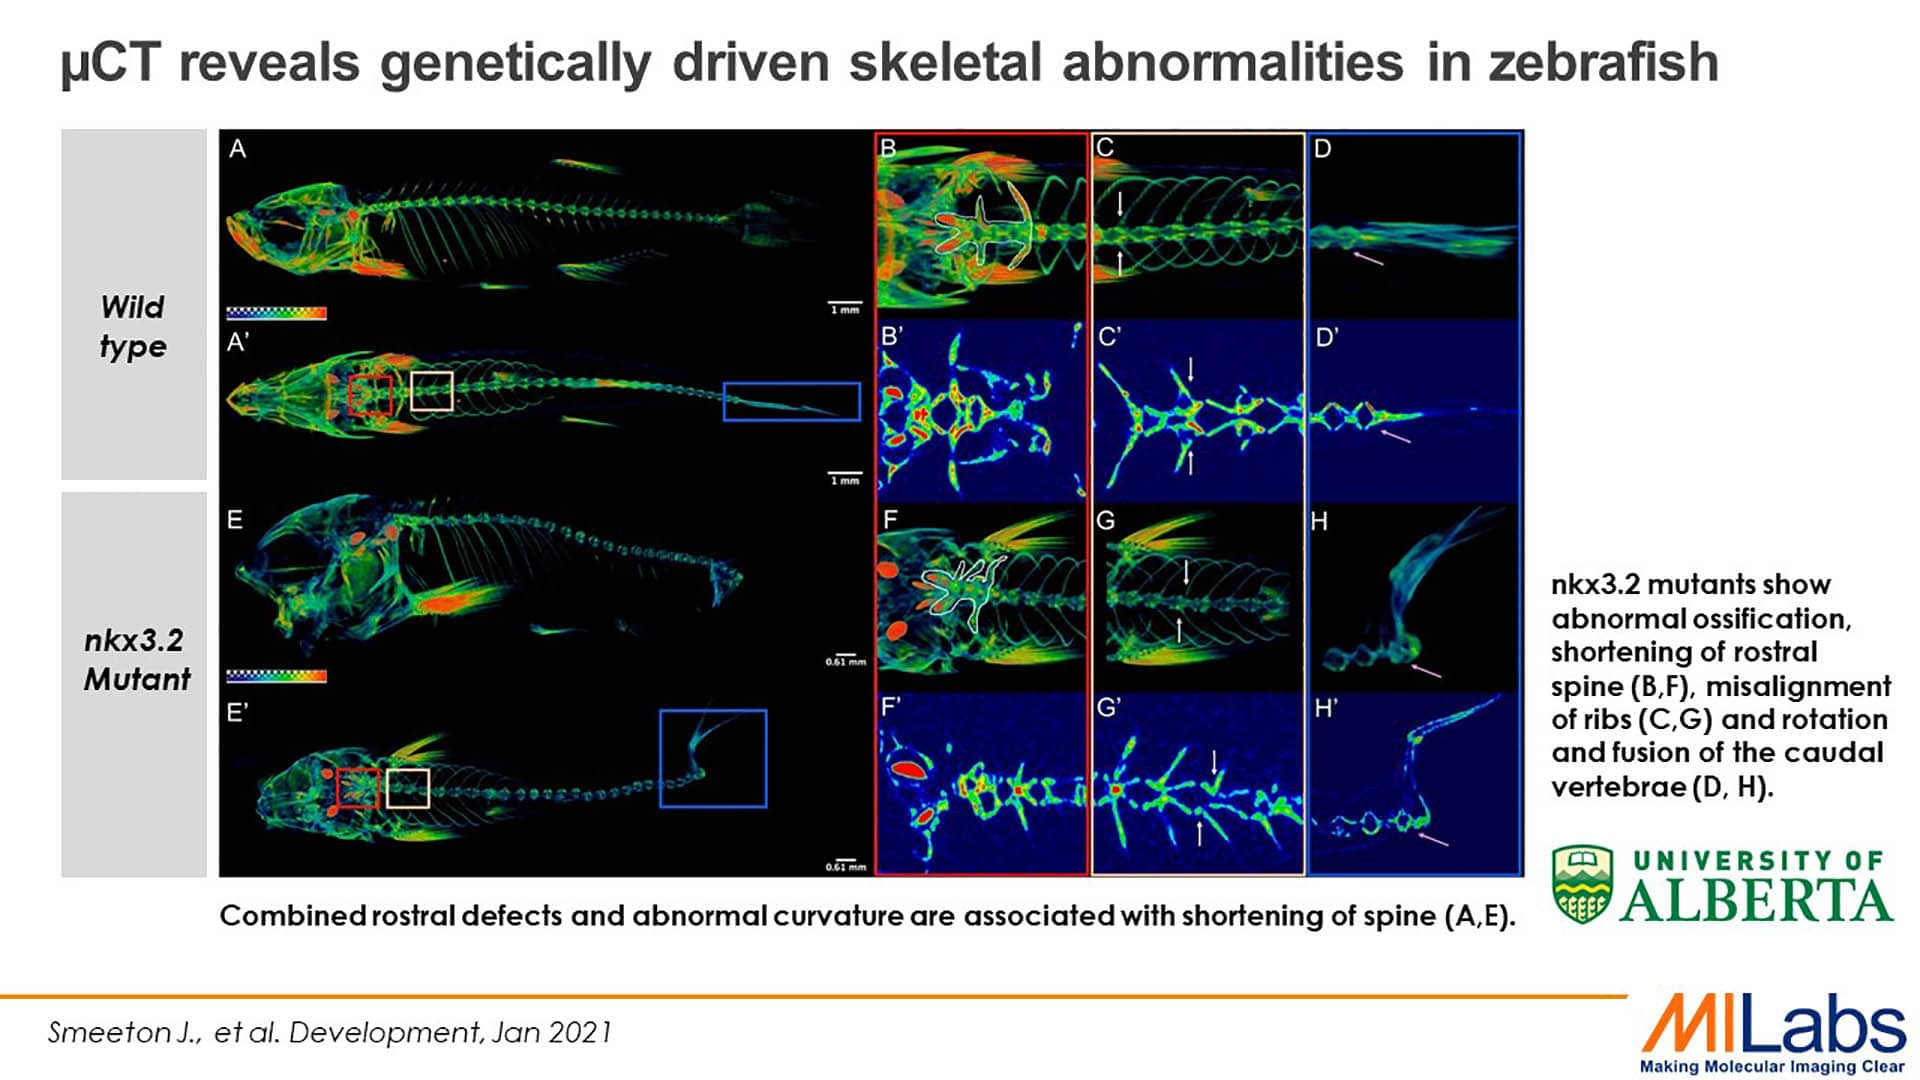 microCT genetically driven skeletal abnormalities in zebrafish